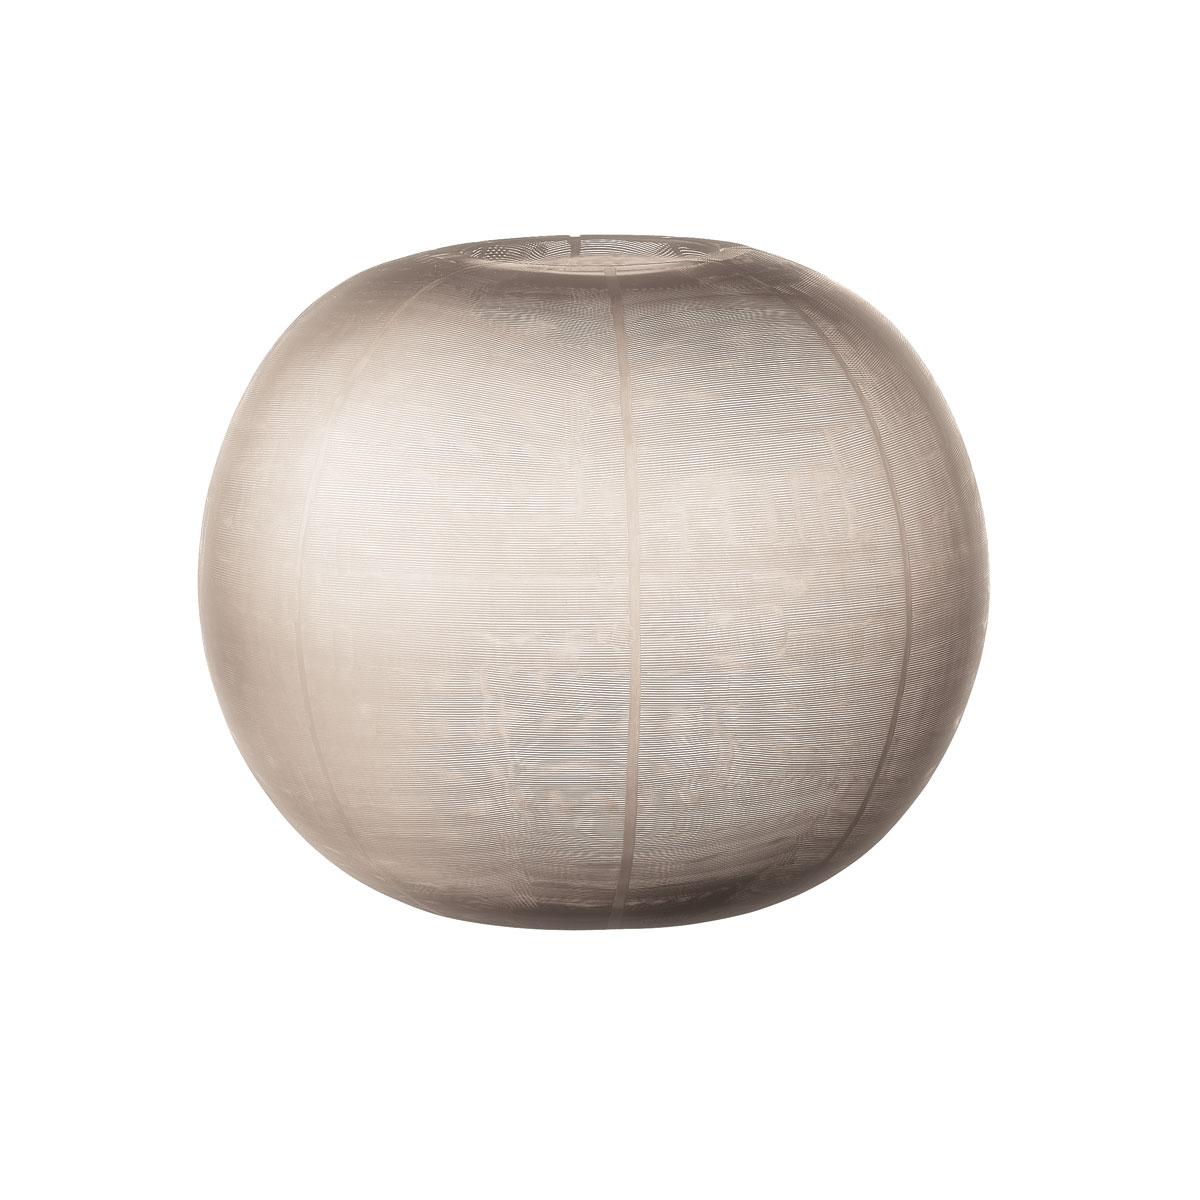 Lenox Donna Karan Artisan Glass, Icicle, Etched Grand Globe